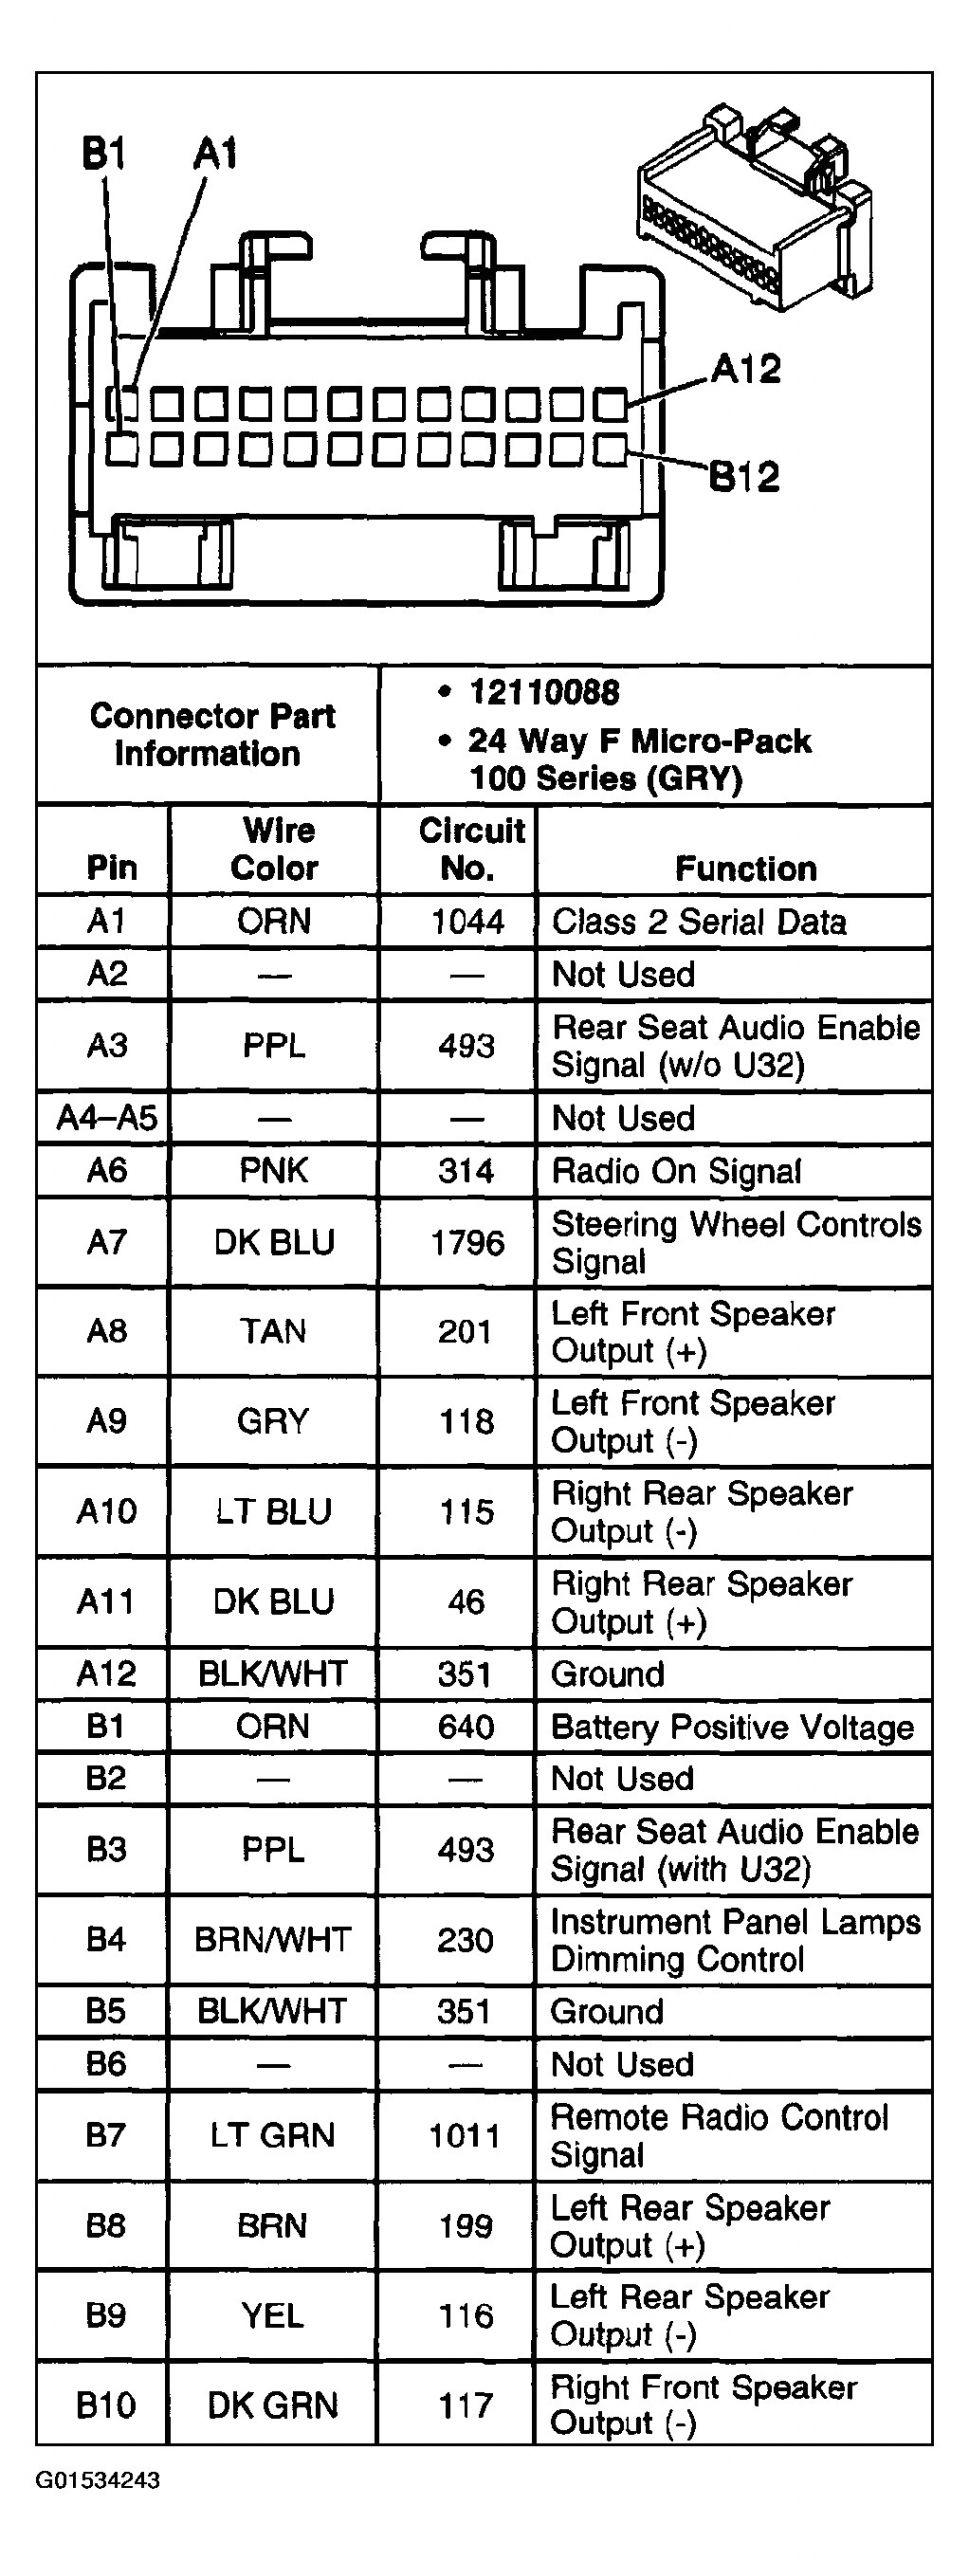 2004 trailblazer radio wiring diagram simple 9 2002 chevy stereo jpg